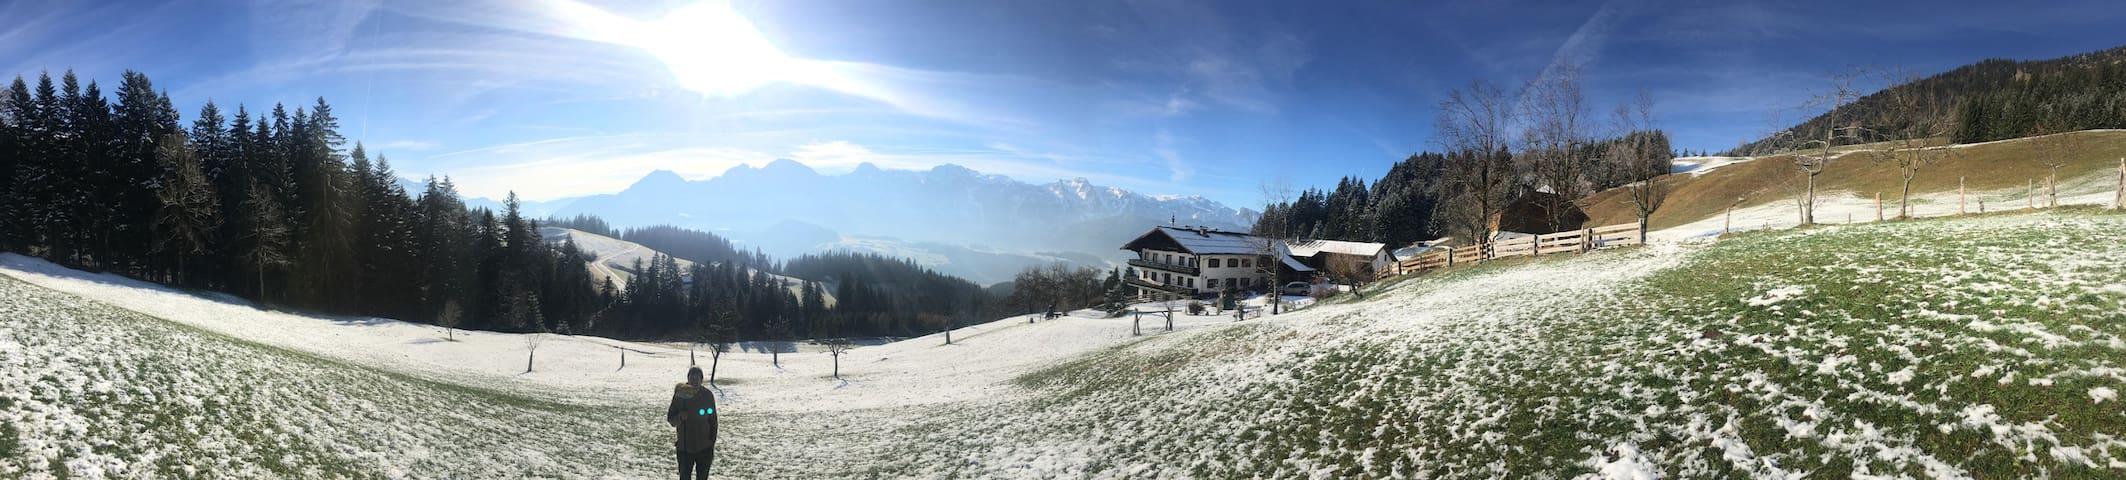 Gusti's Urlaub am Bauernhof mit Panorama - Abtenau - เกสต์เฮาส์